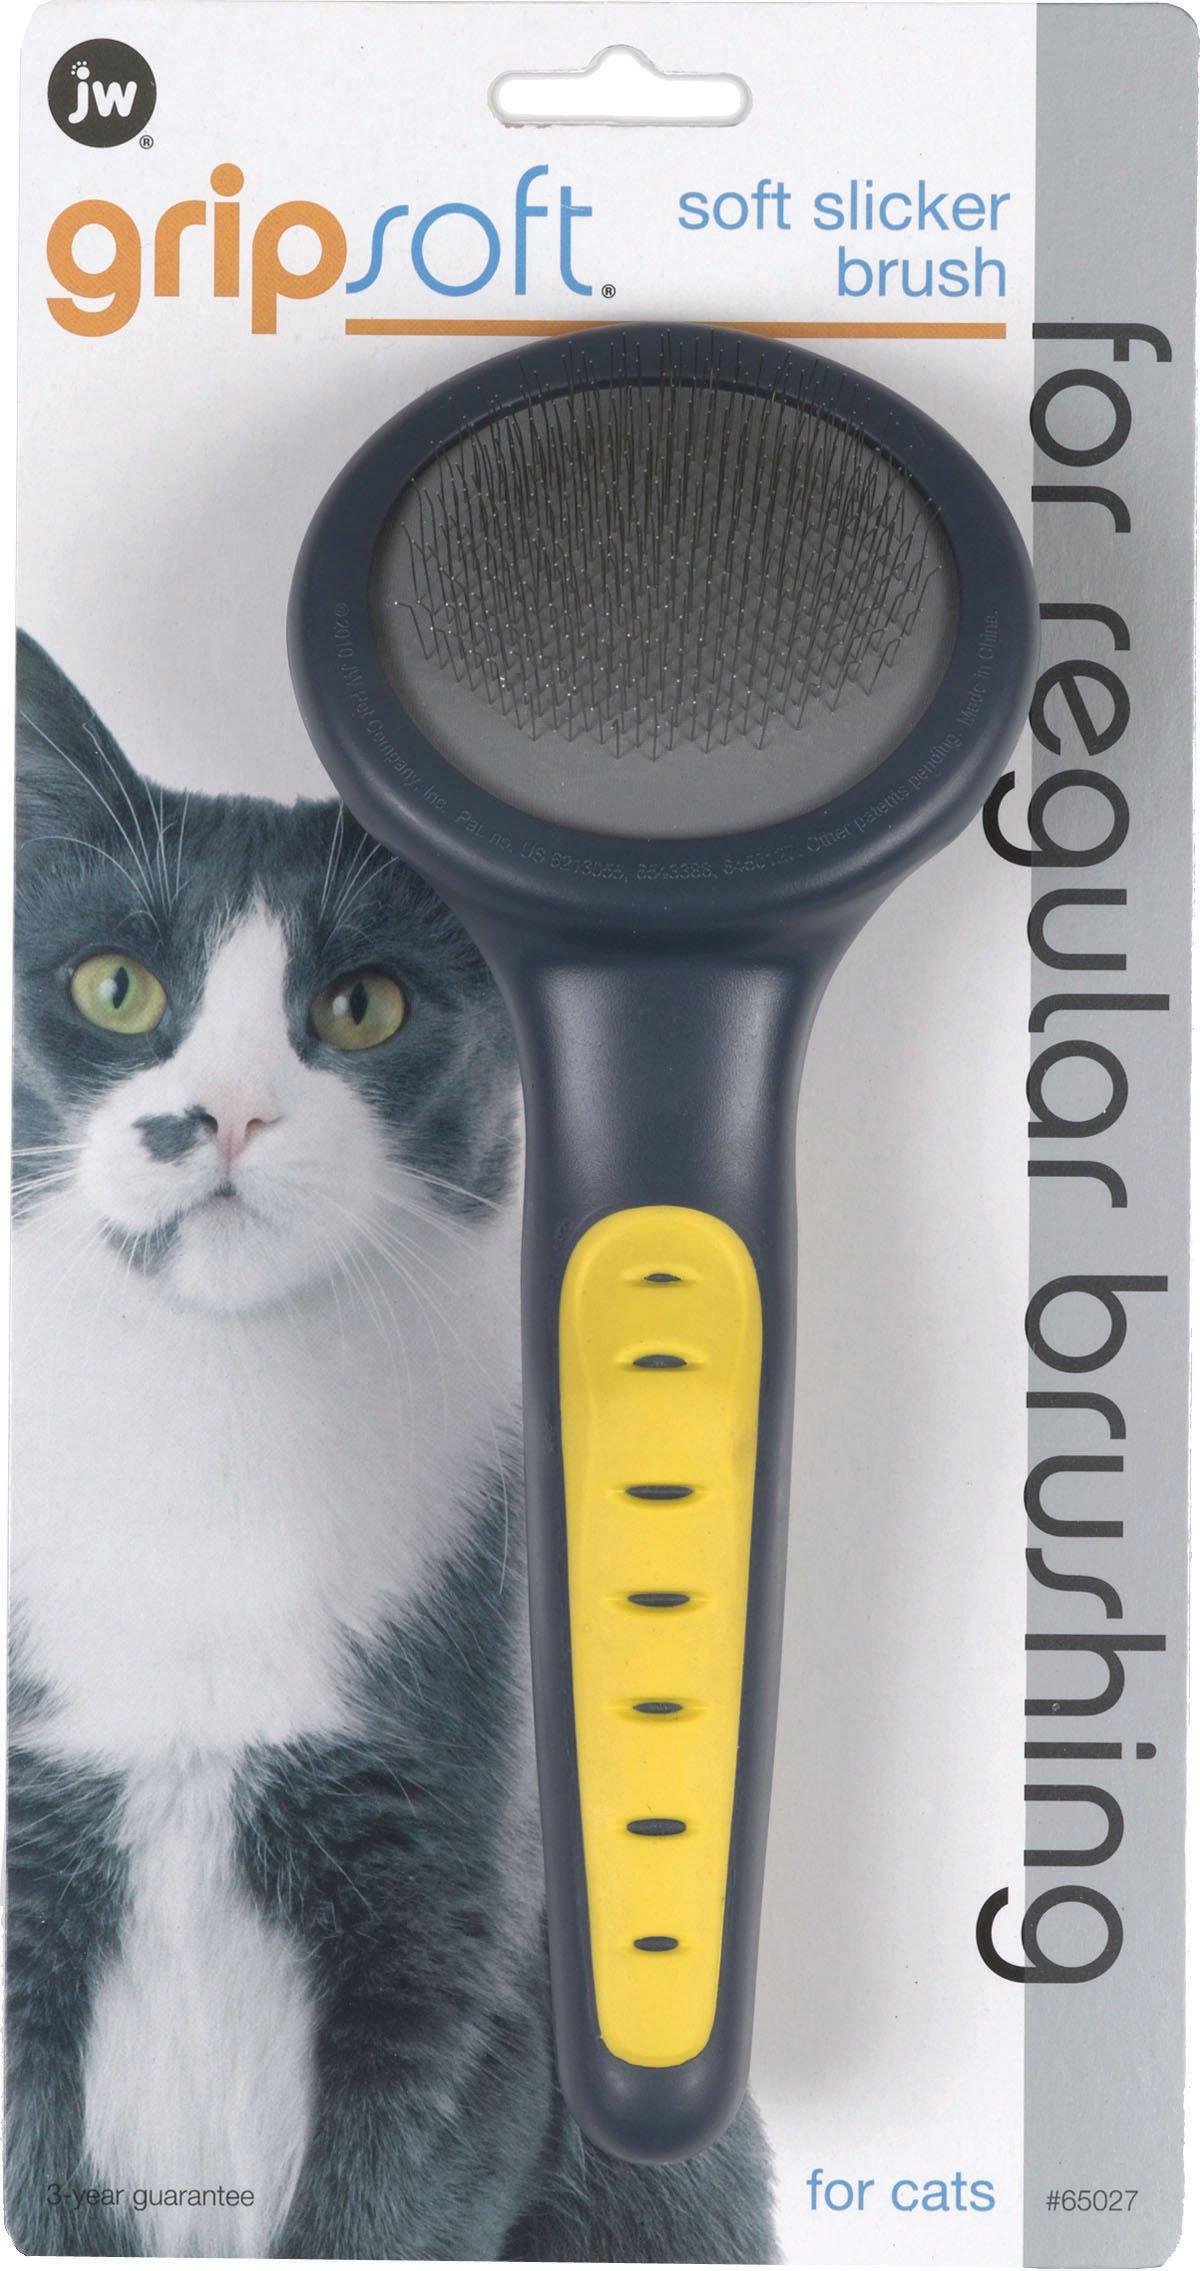 JW Gripsoft Cat Slicker Brush Cat Slicker Brush - Pack of 12 by JW Pet